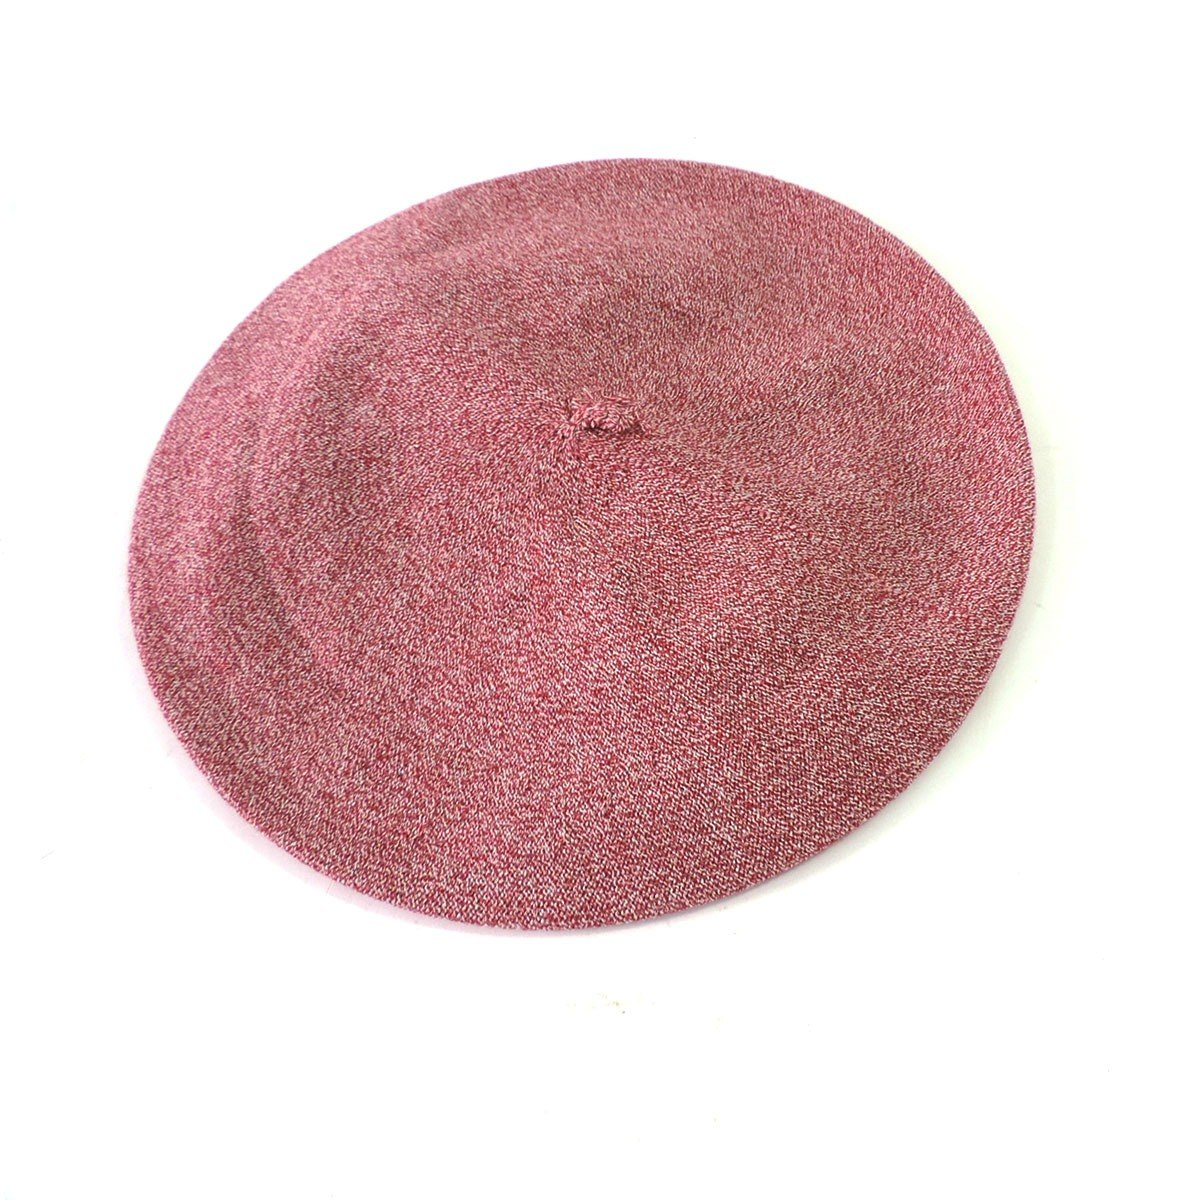 boina algodon tolosa sin tafilete sombrero calidad crespo. Cargando zoom. 2a6028d57aa